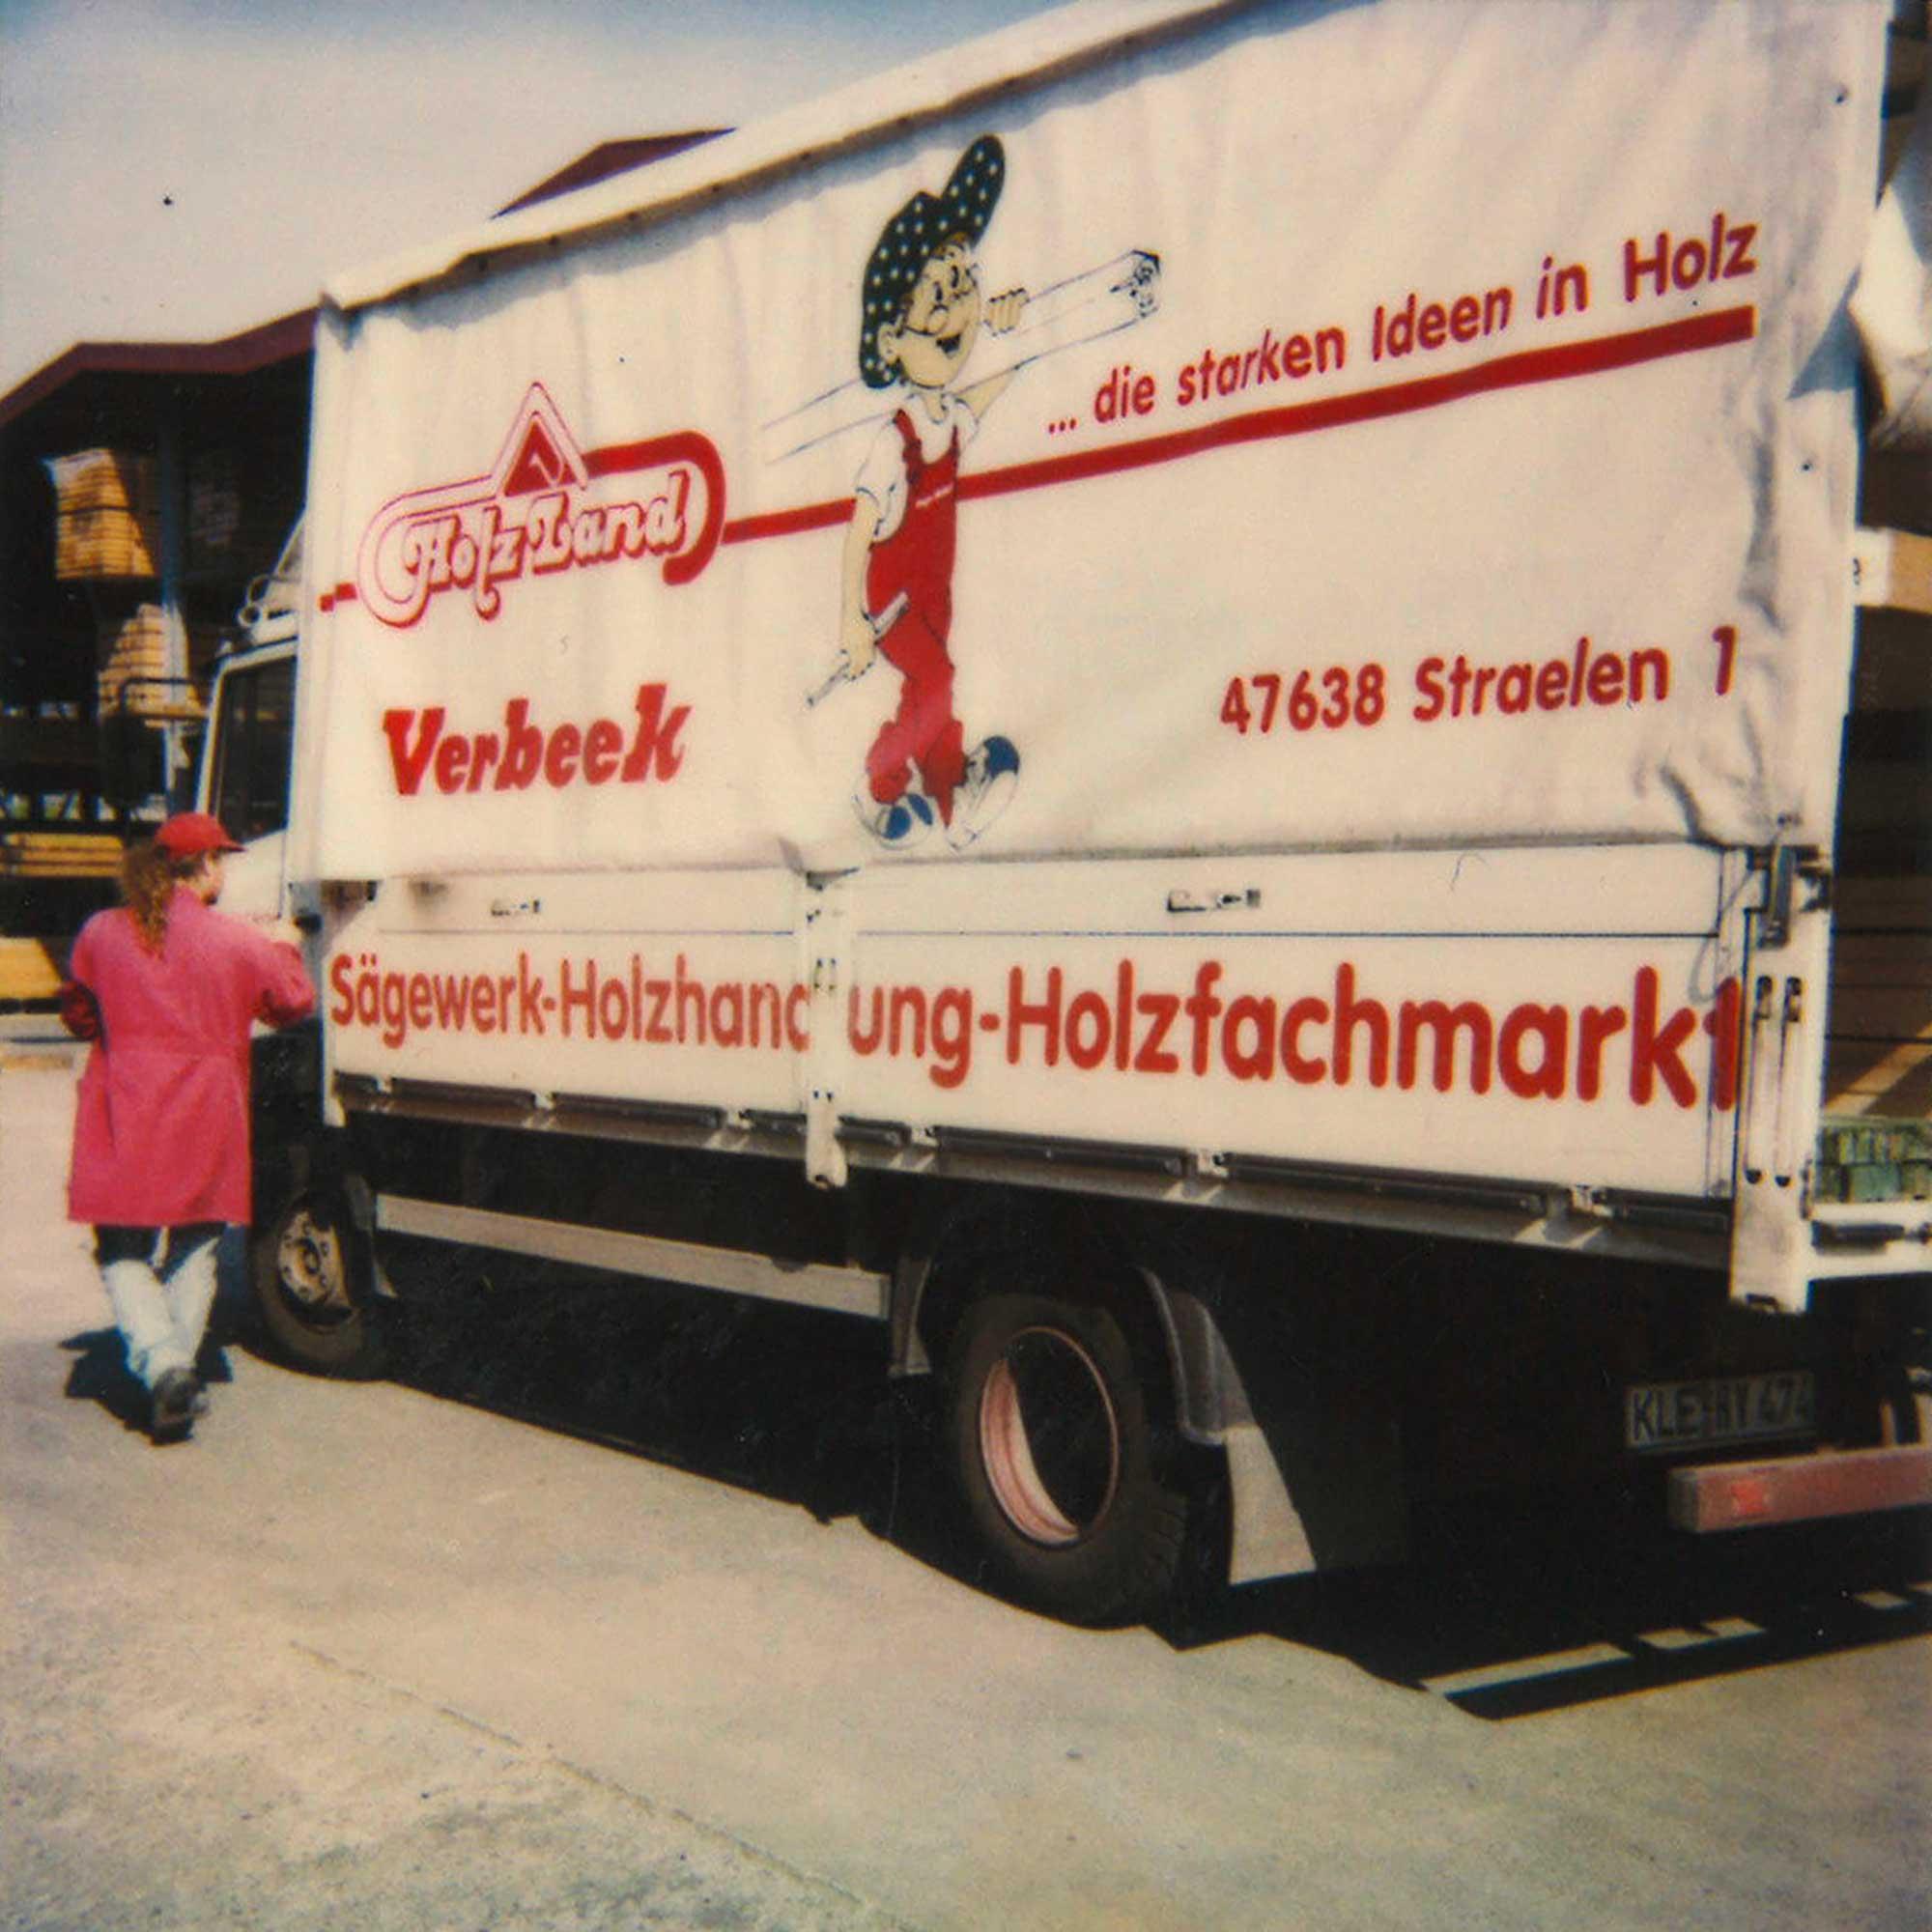 Verbeek-LKW vor dem riesigen Holzlager in Straelen